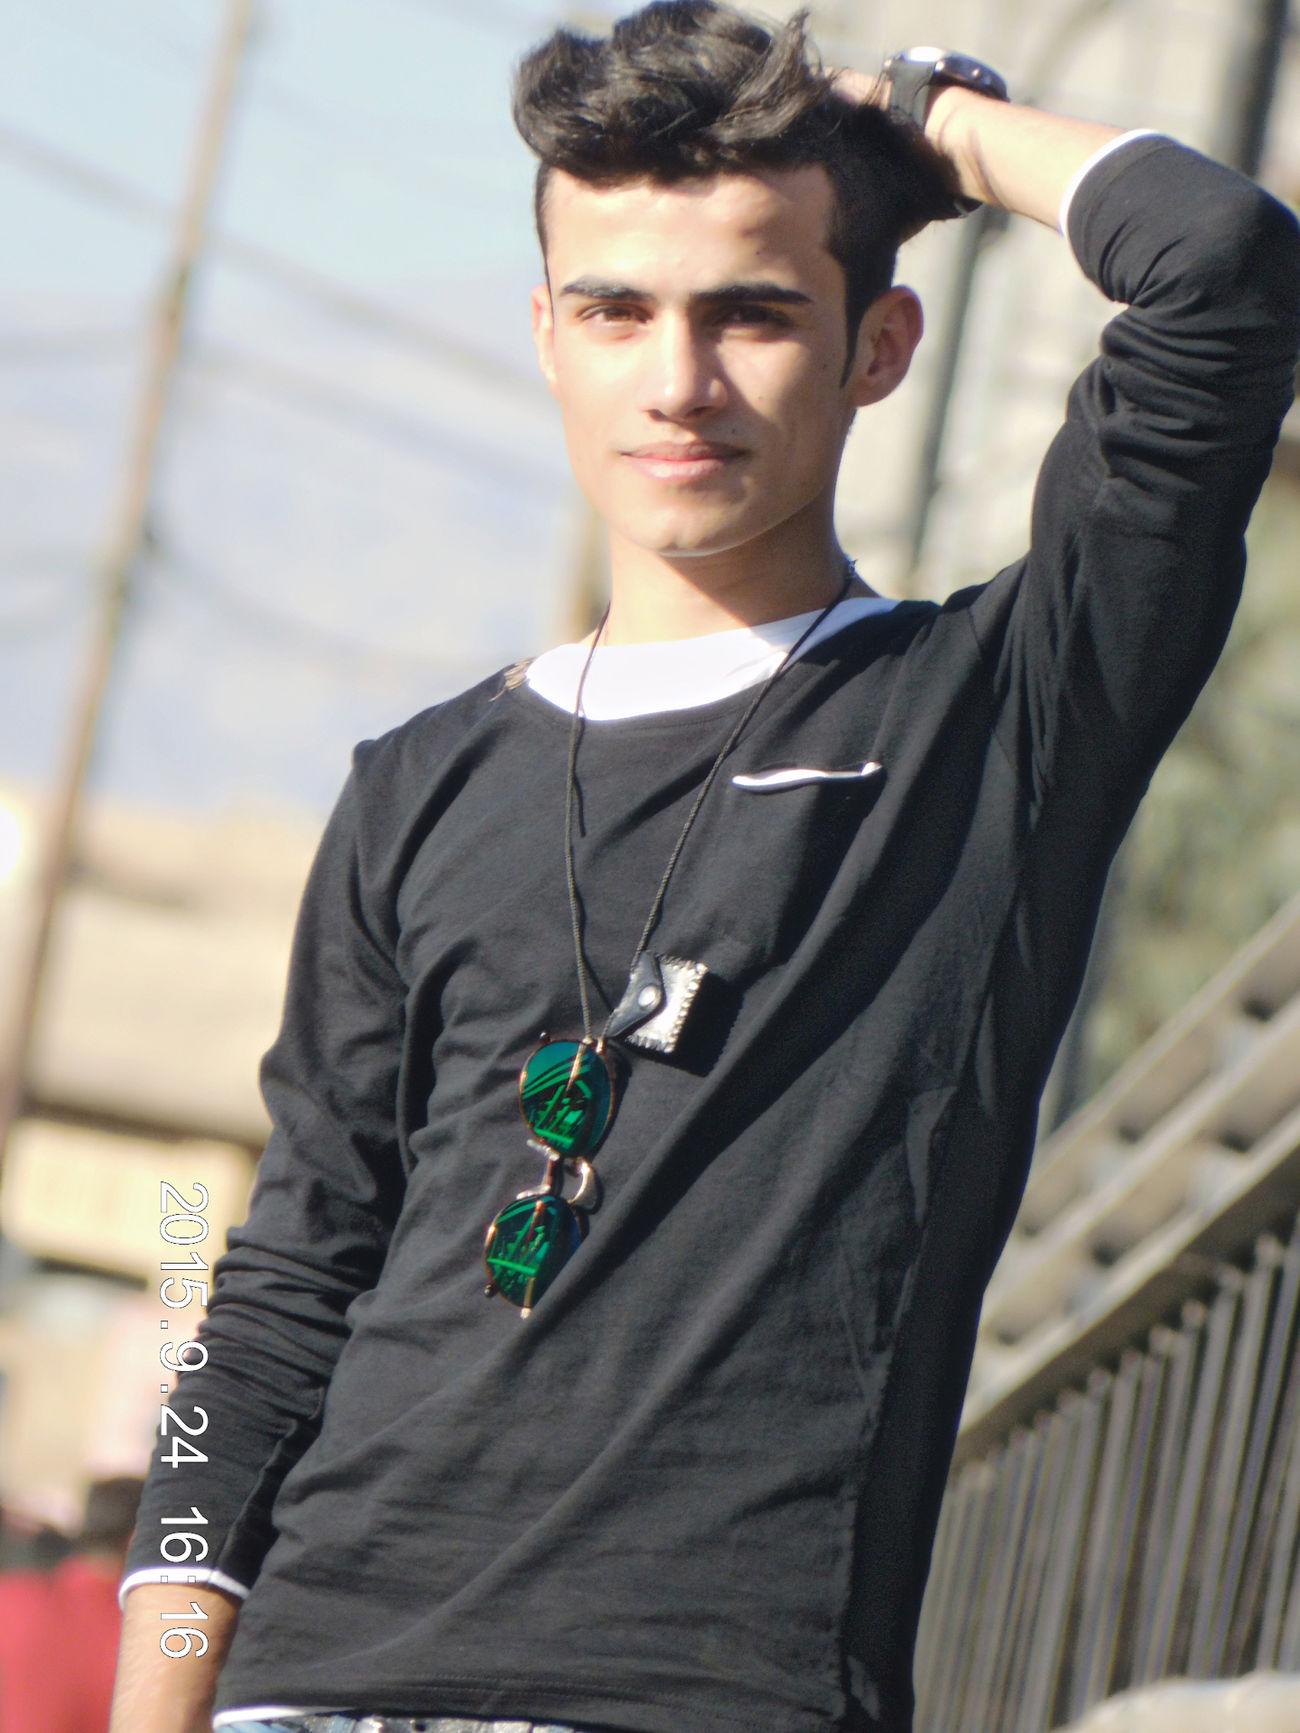 That's Me ı ♥ Kurdistan HappyEid Roko.8 Style